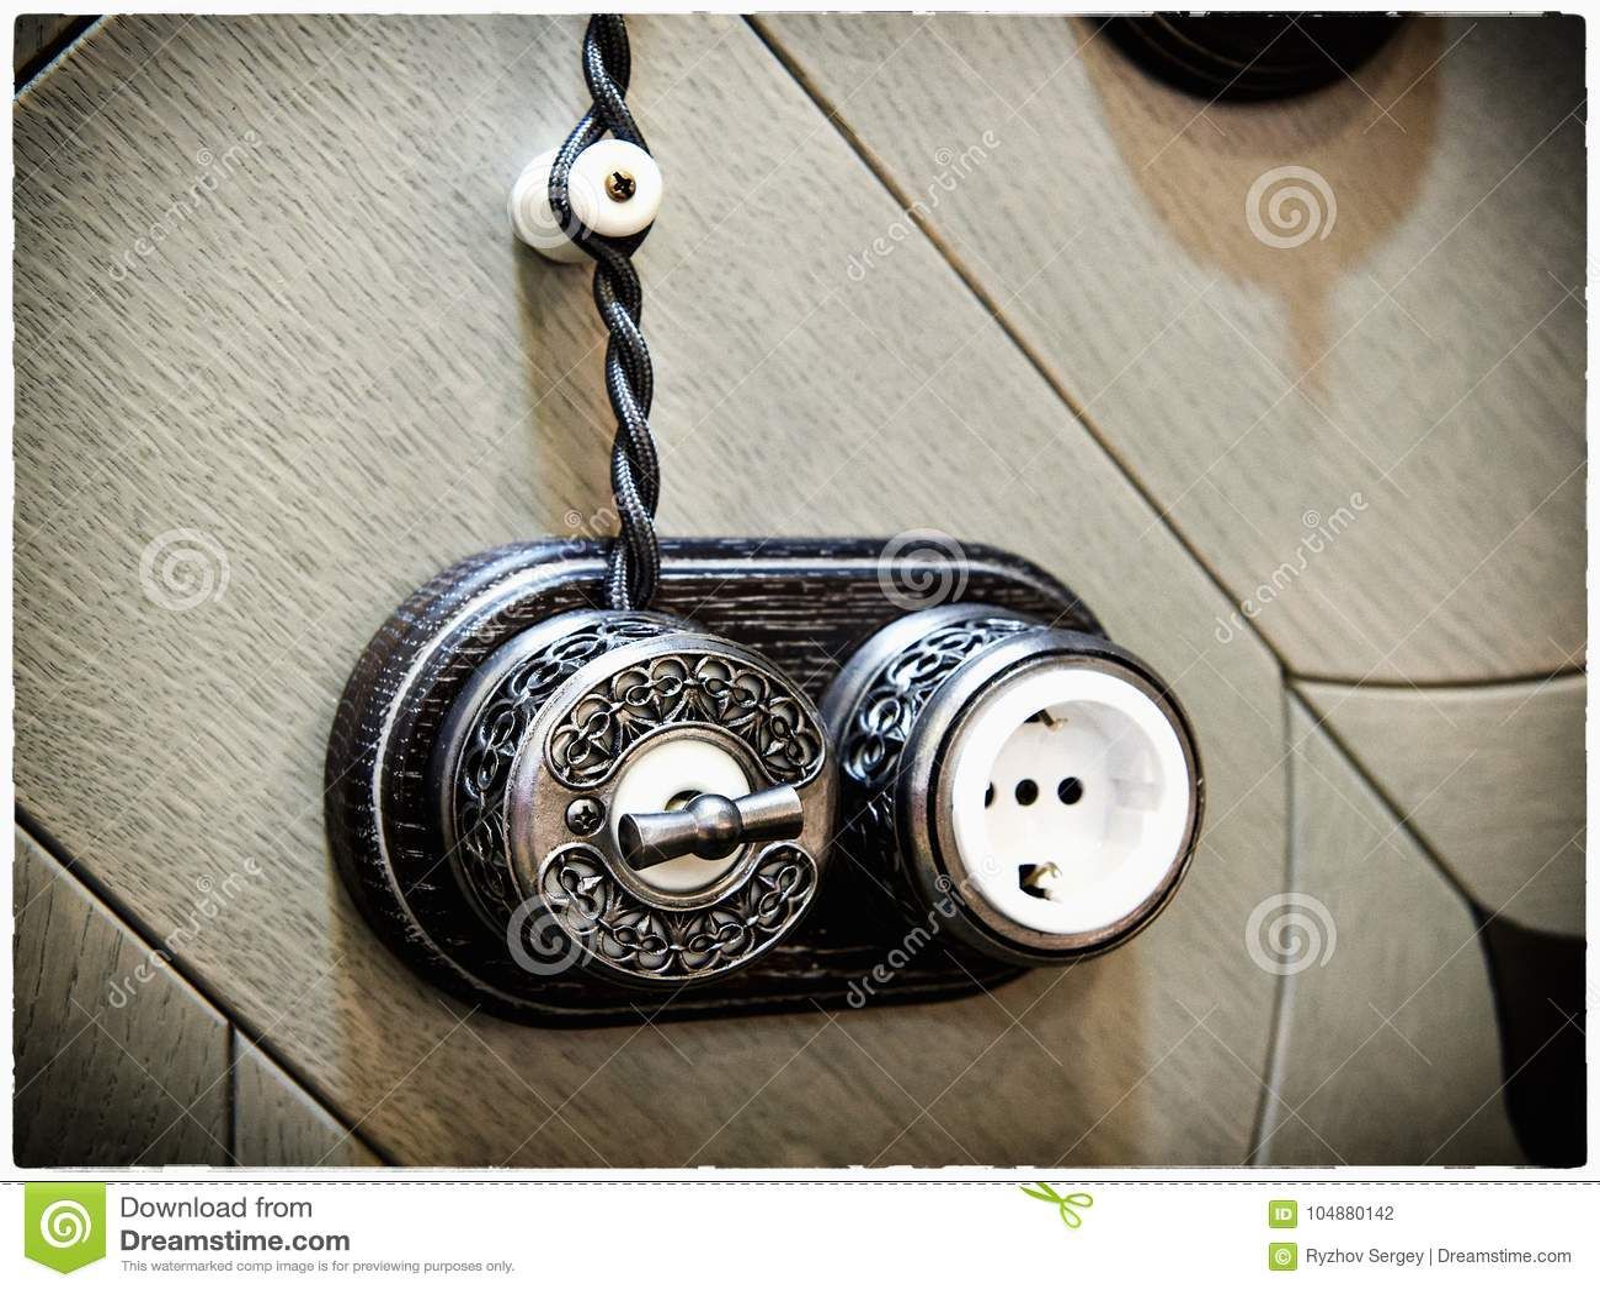 Retro Light Switch And Socket Stock Photo - Image of power ...